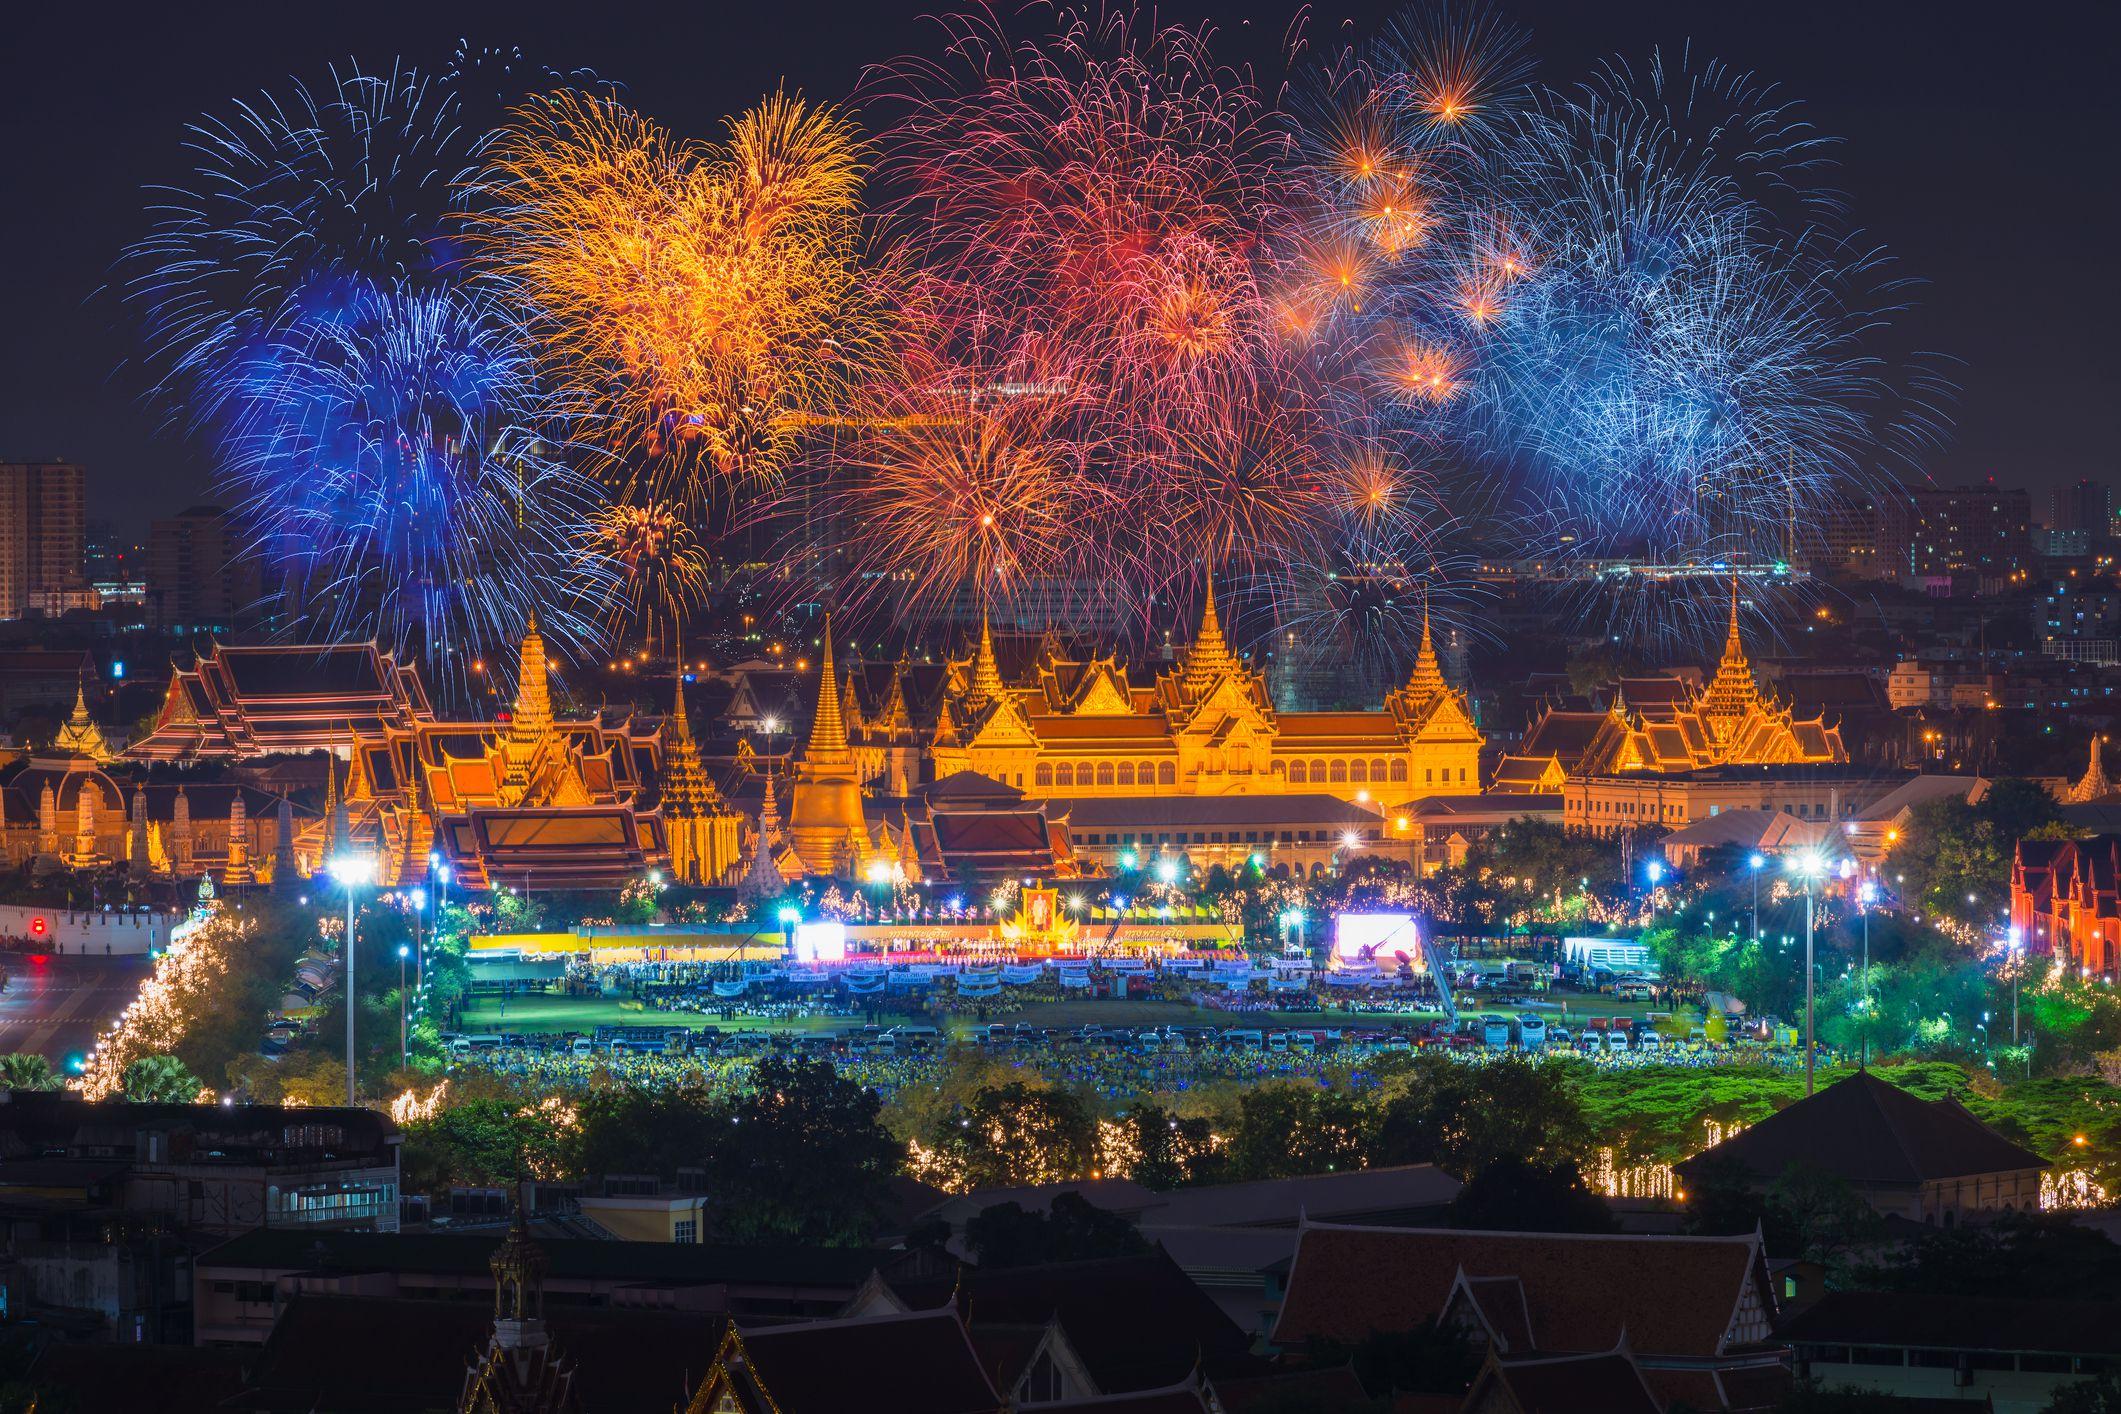 Grand palace at twilight in Bangkok during King's birthday celebration